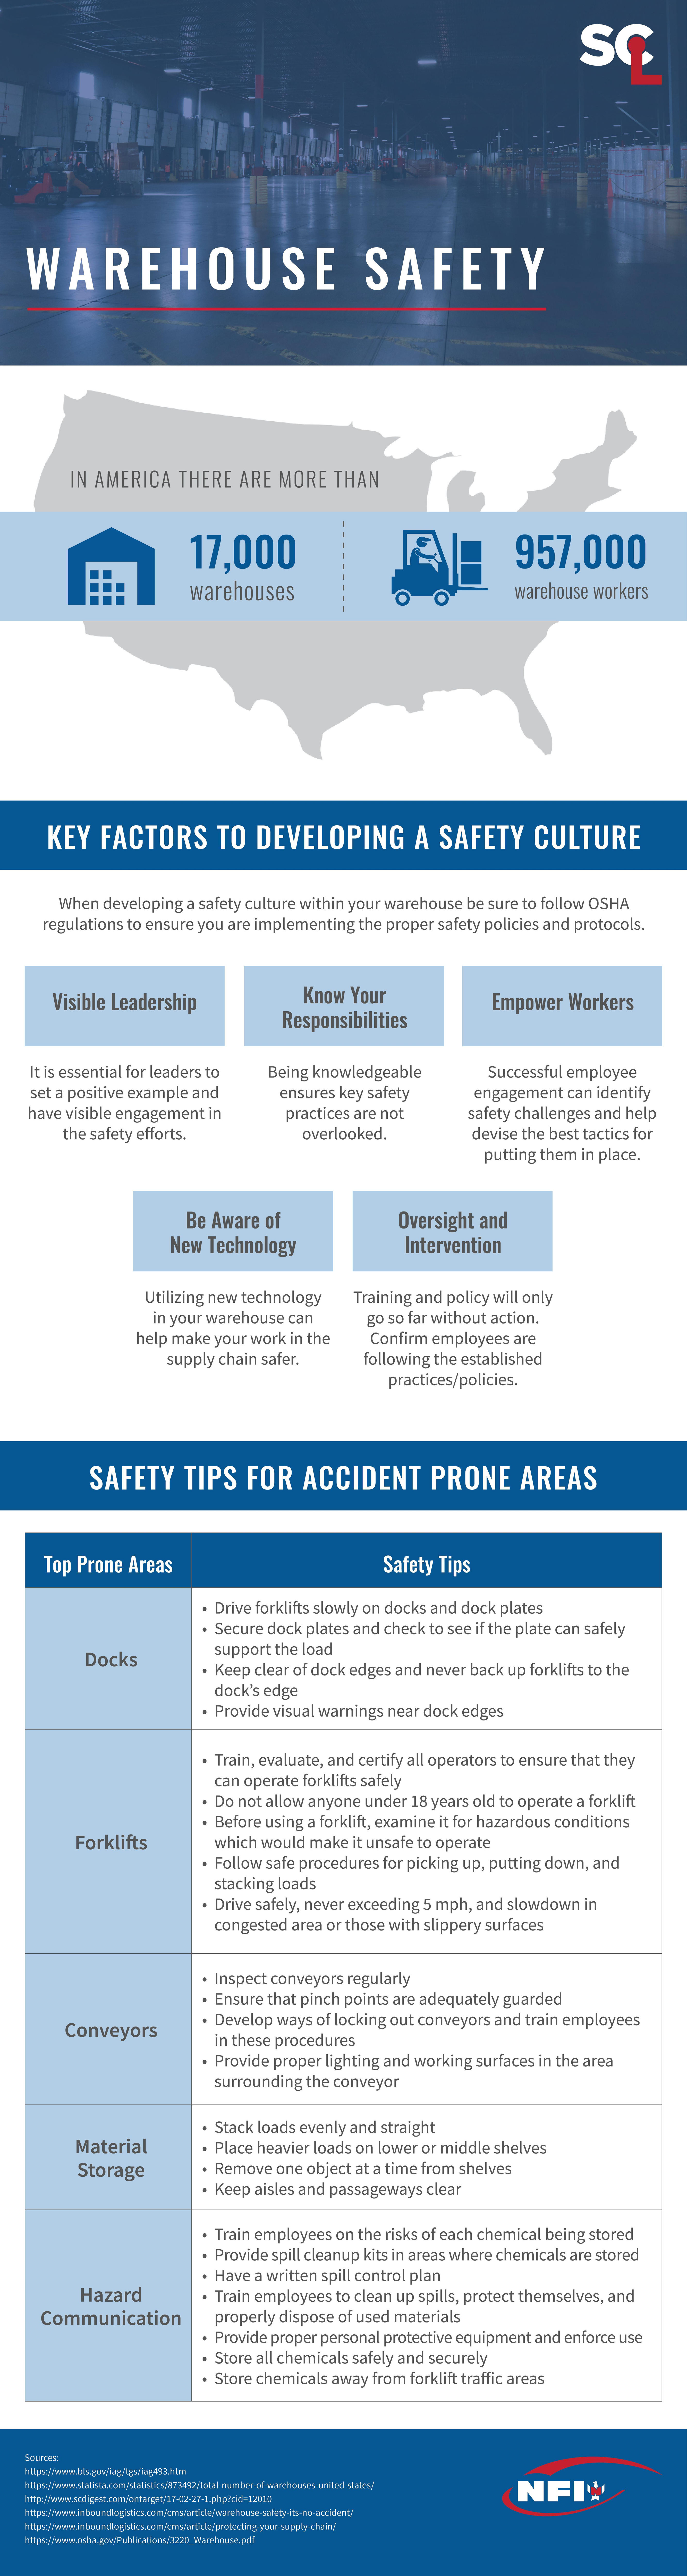 Warehouse Safety Infographic Warehousing Warehouse